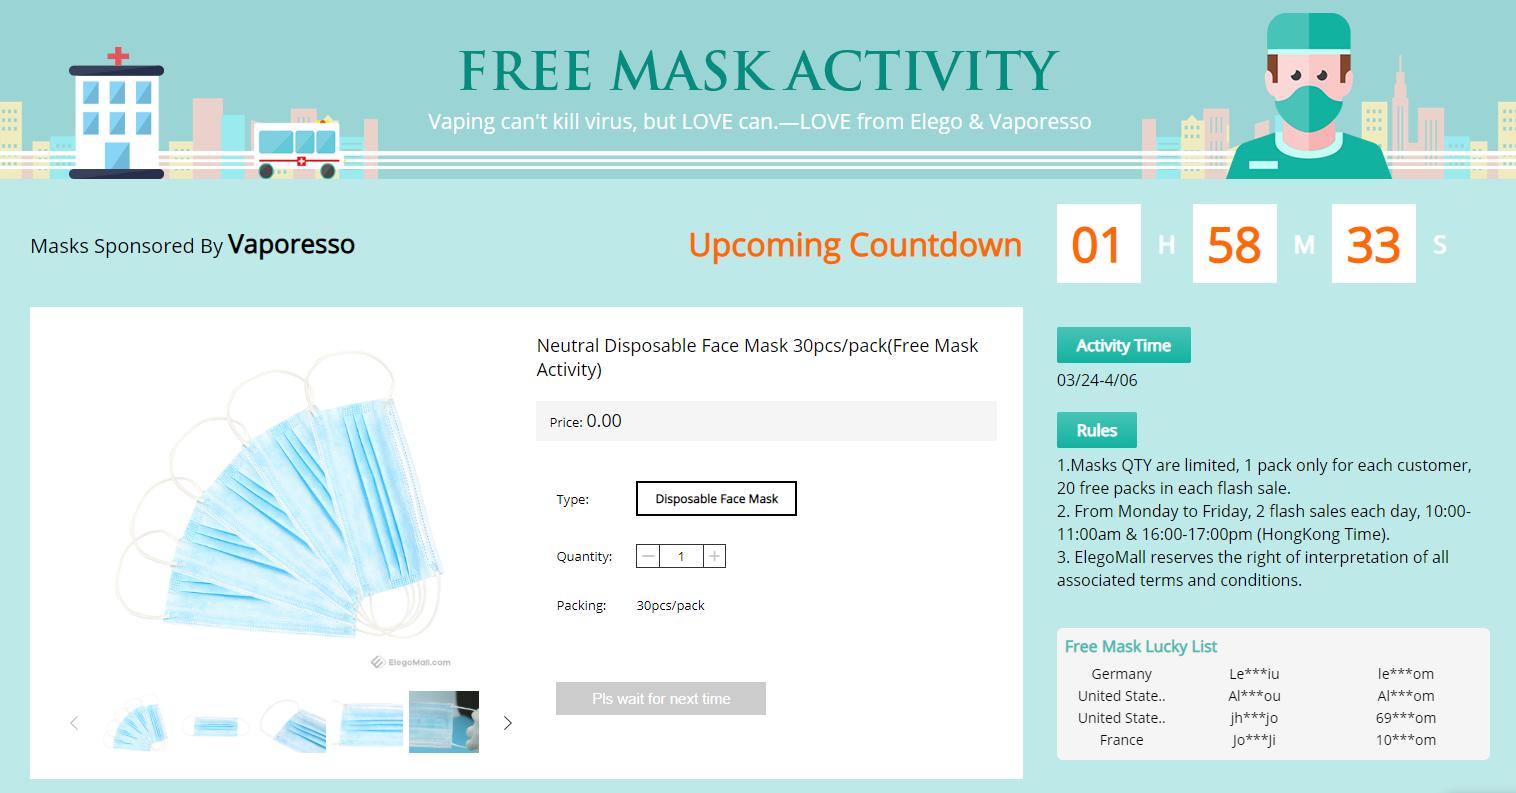 elegomall-free-mask_1G7KO.png